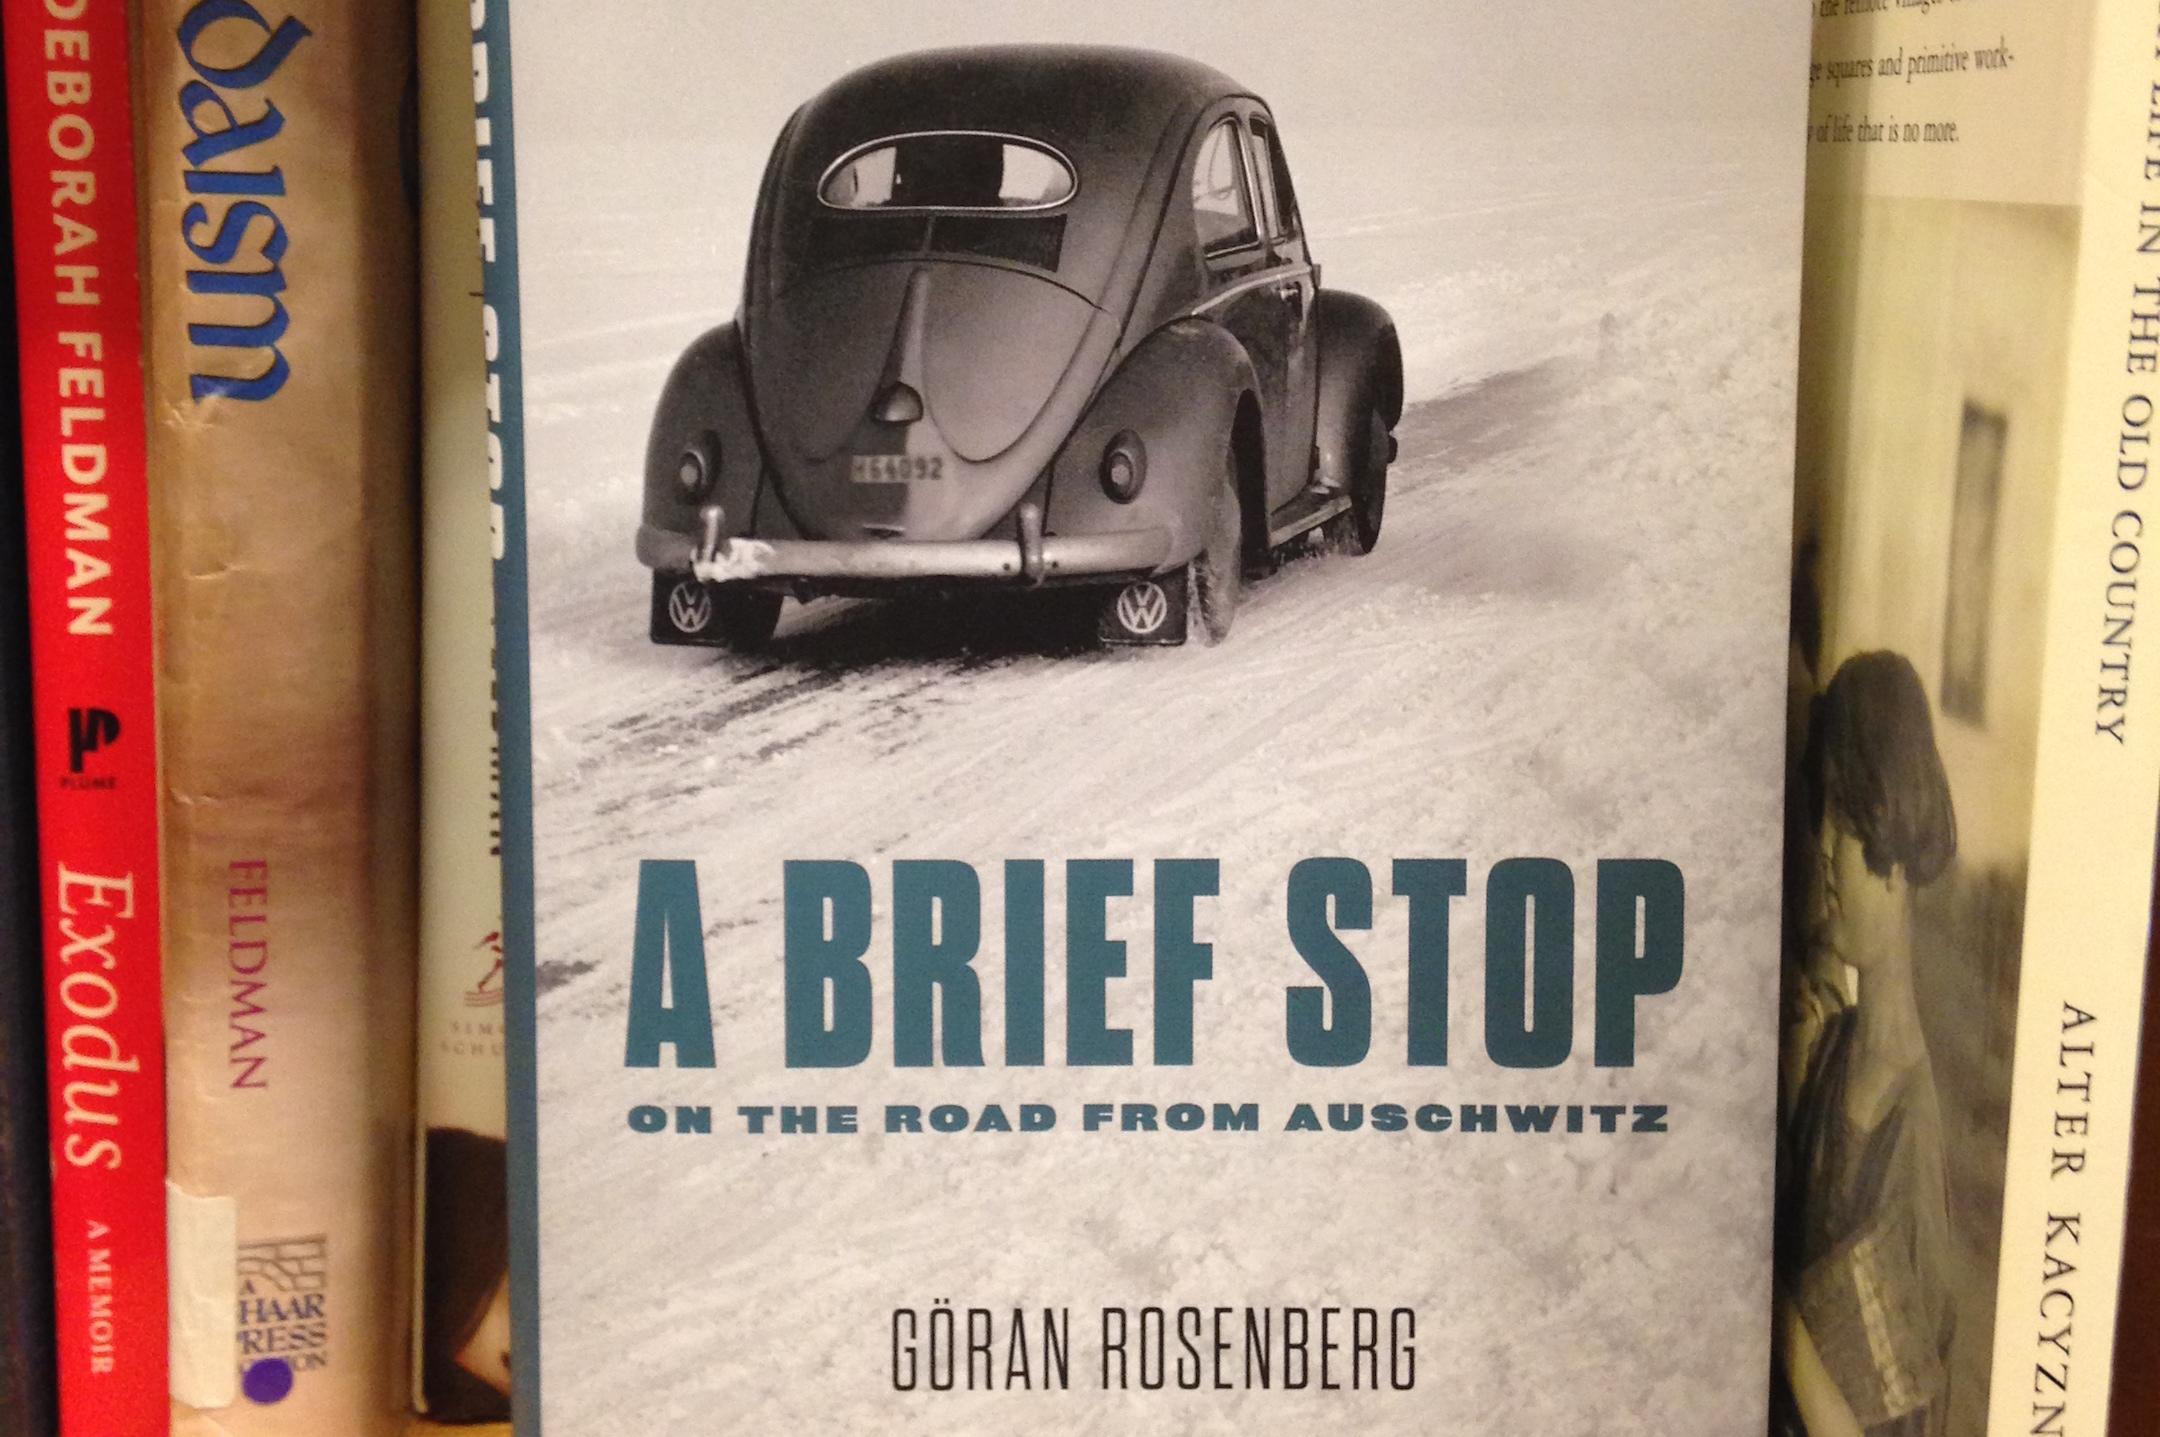 About Göran Rosenberg